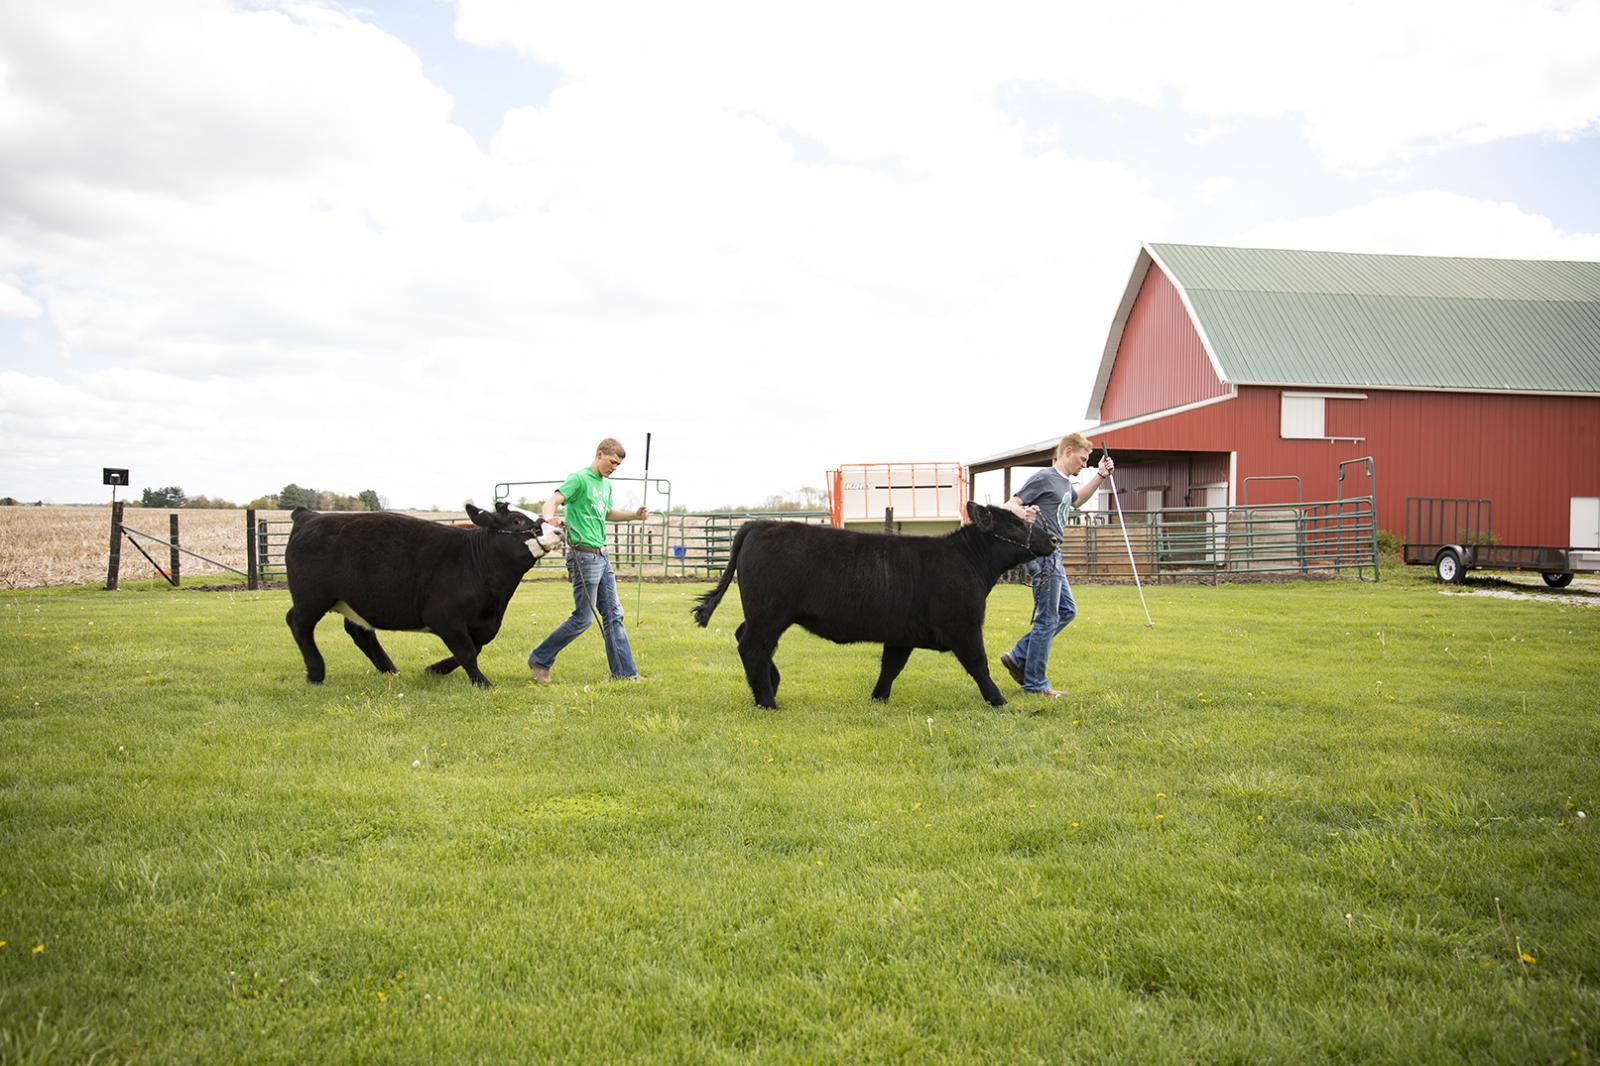 youth leading show calves through barn yard